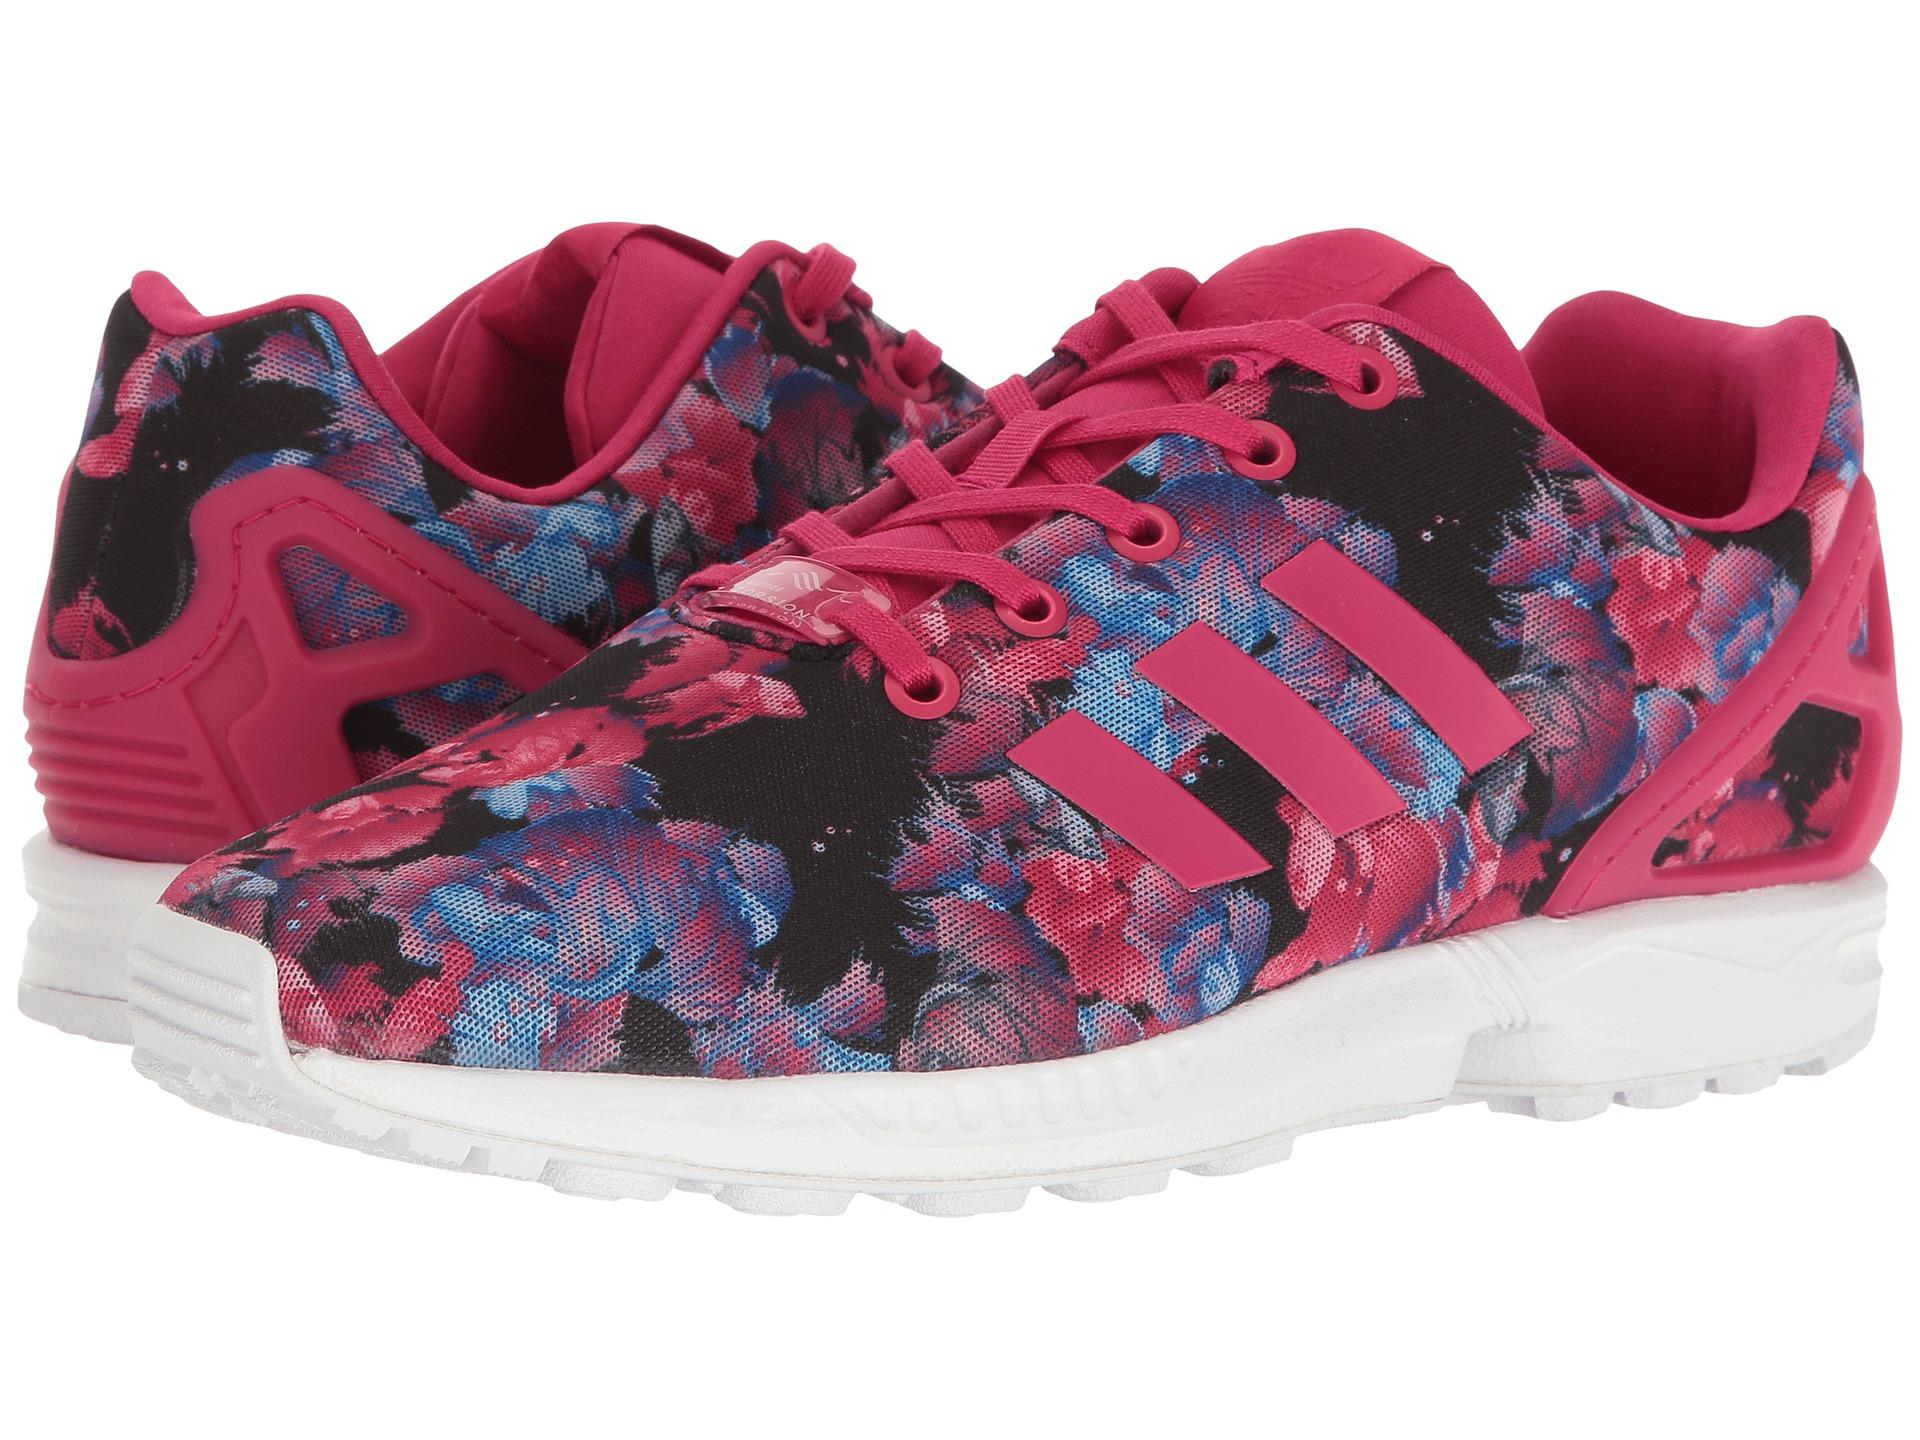 9cdd31bac top quality adidas zx flux kids shoes b8977 4f133